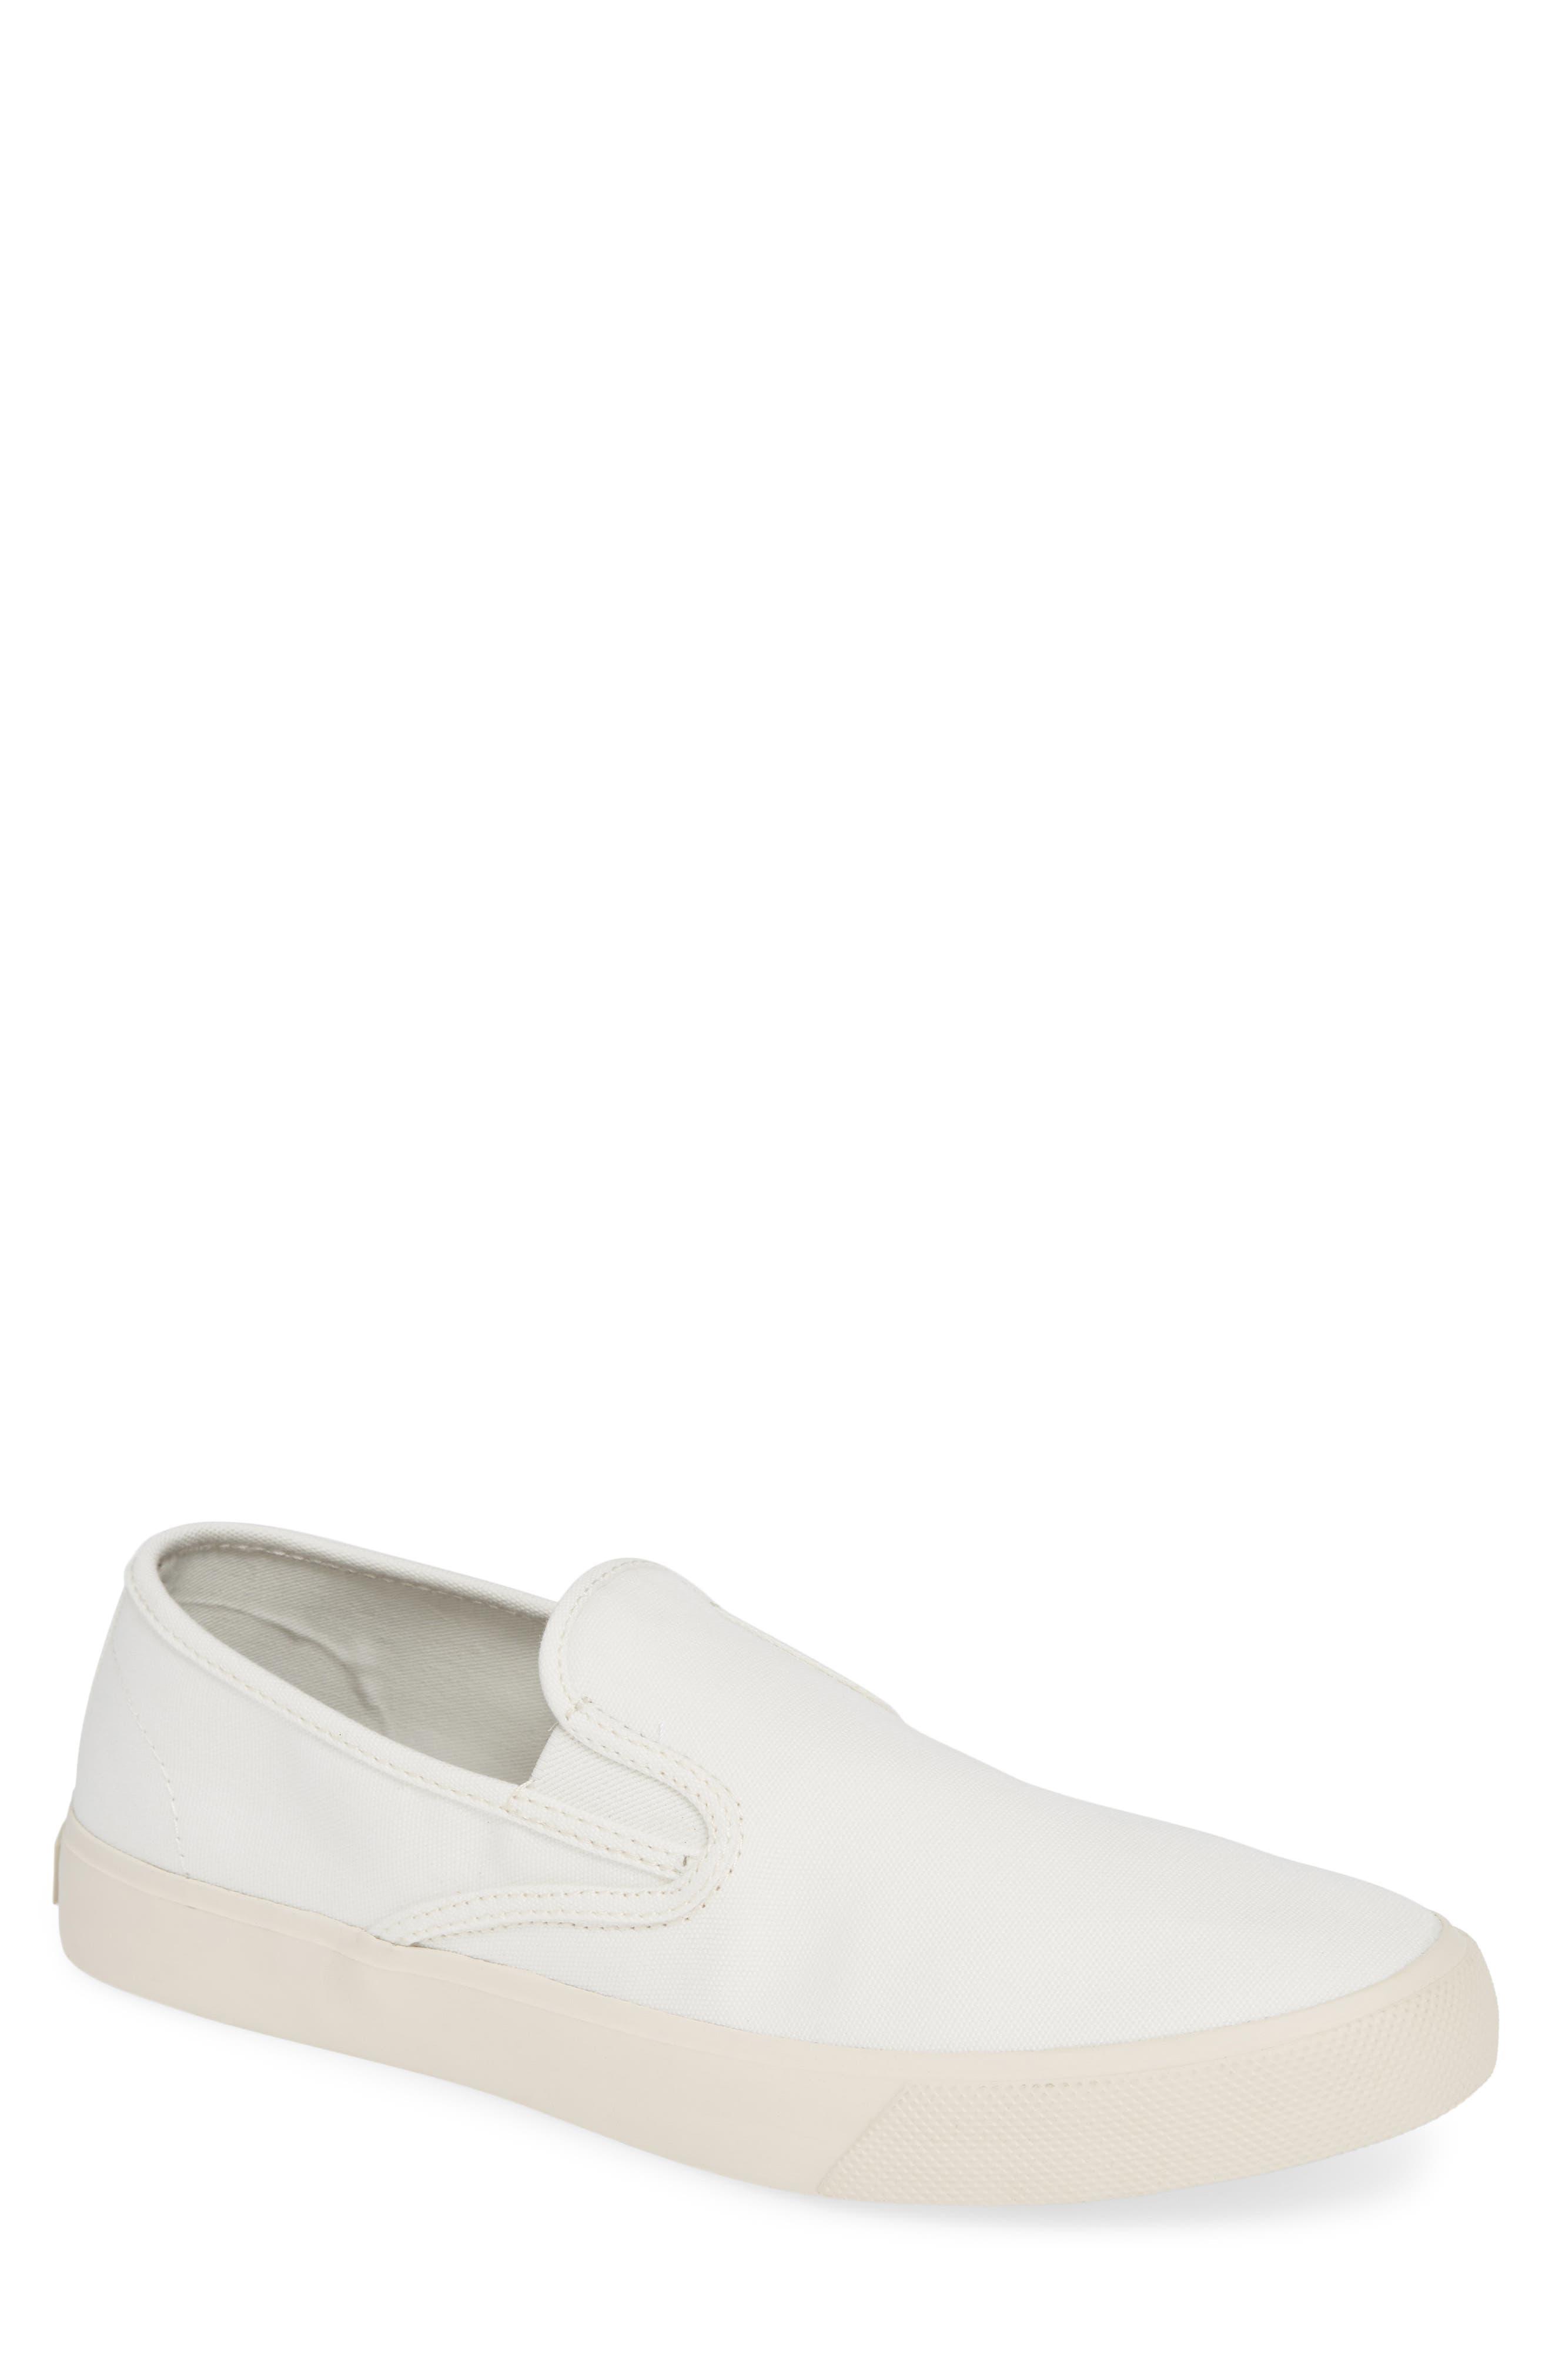 Striper II Slip-On Sneaker,                         Main,                         color, WHITE